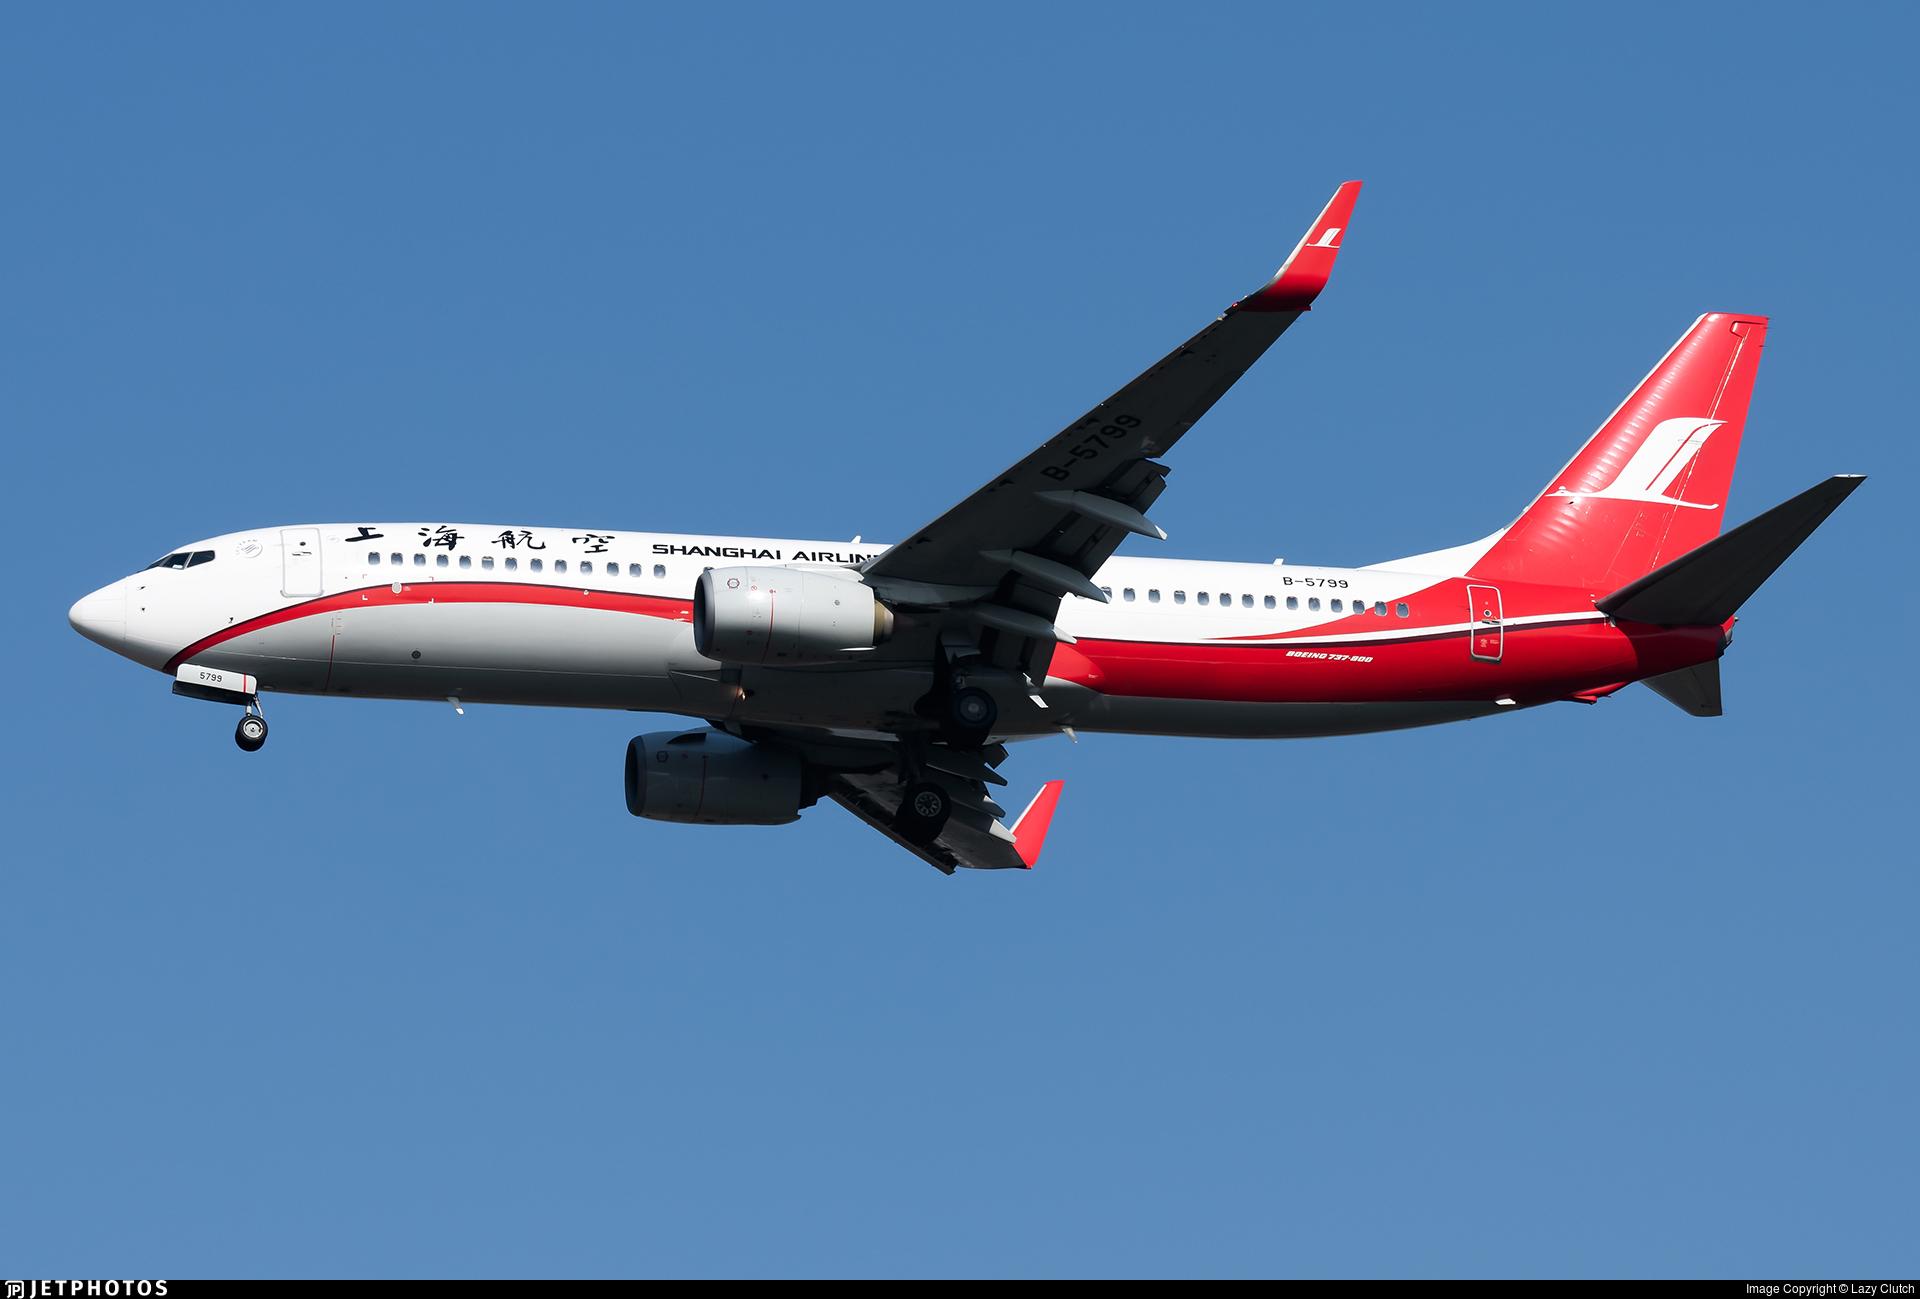 B-5799 - Boeing 737-86D - Shanghai Airlines